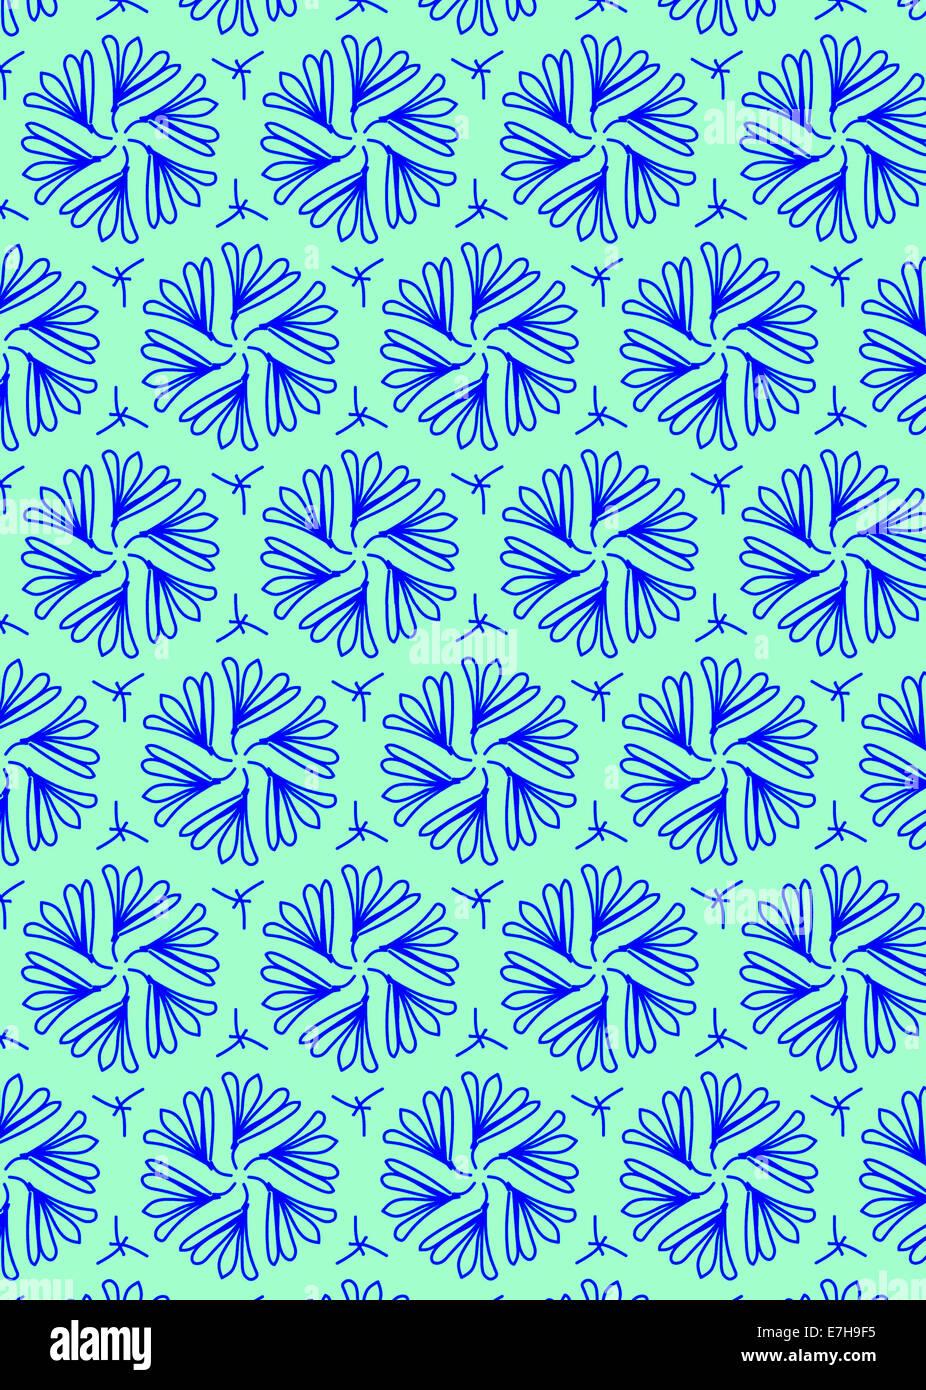 illustration of symmetrical design wallpaper - Stock Image